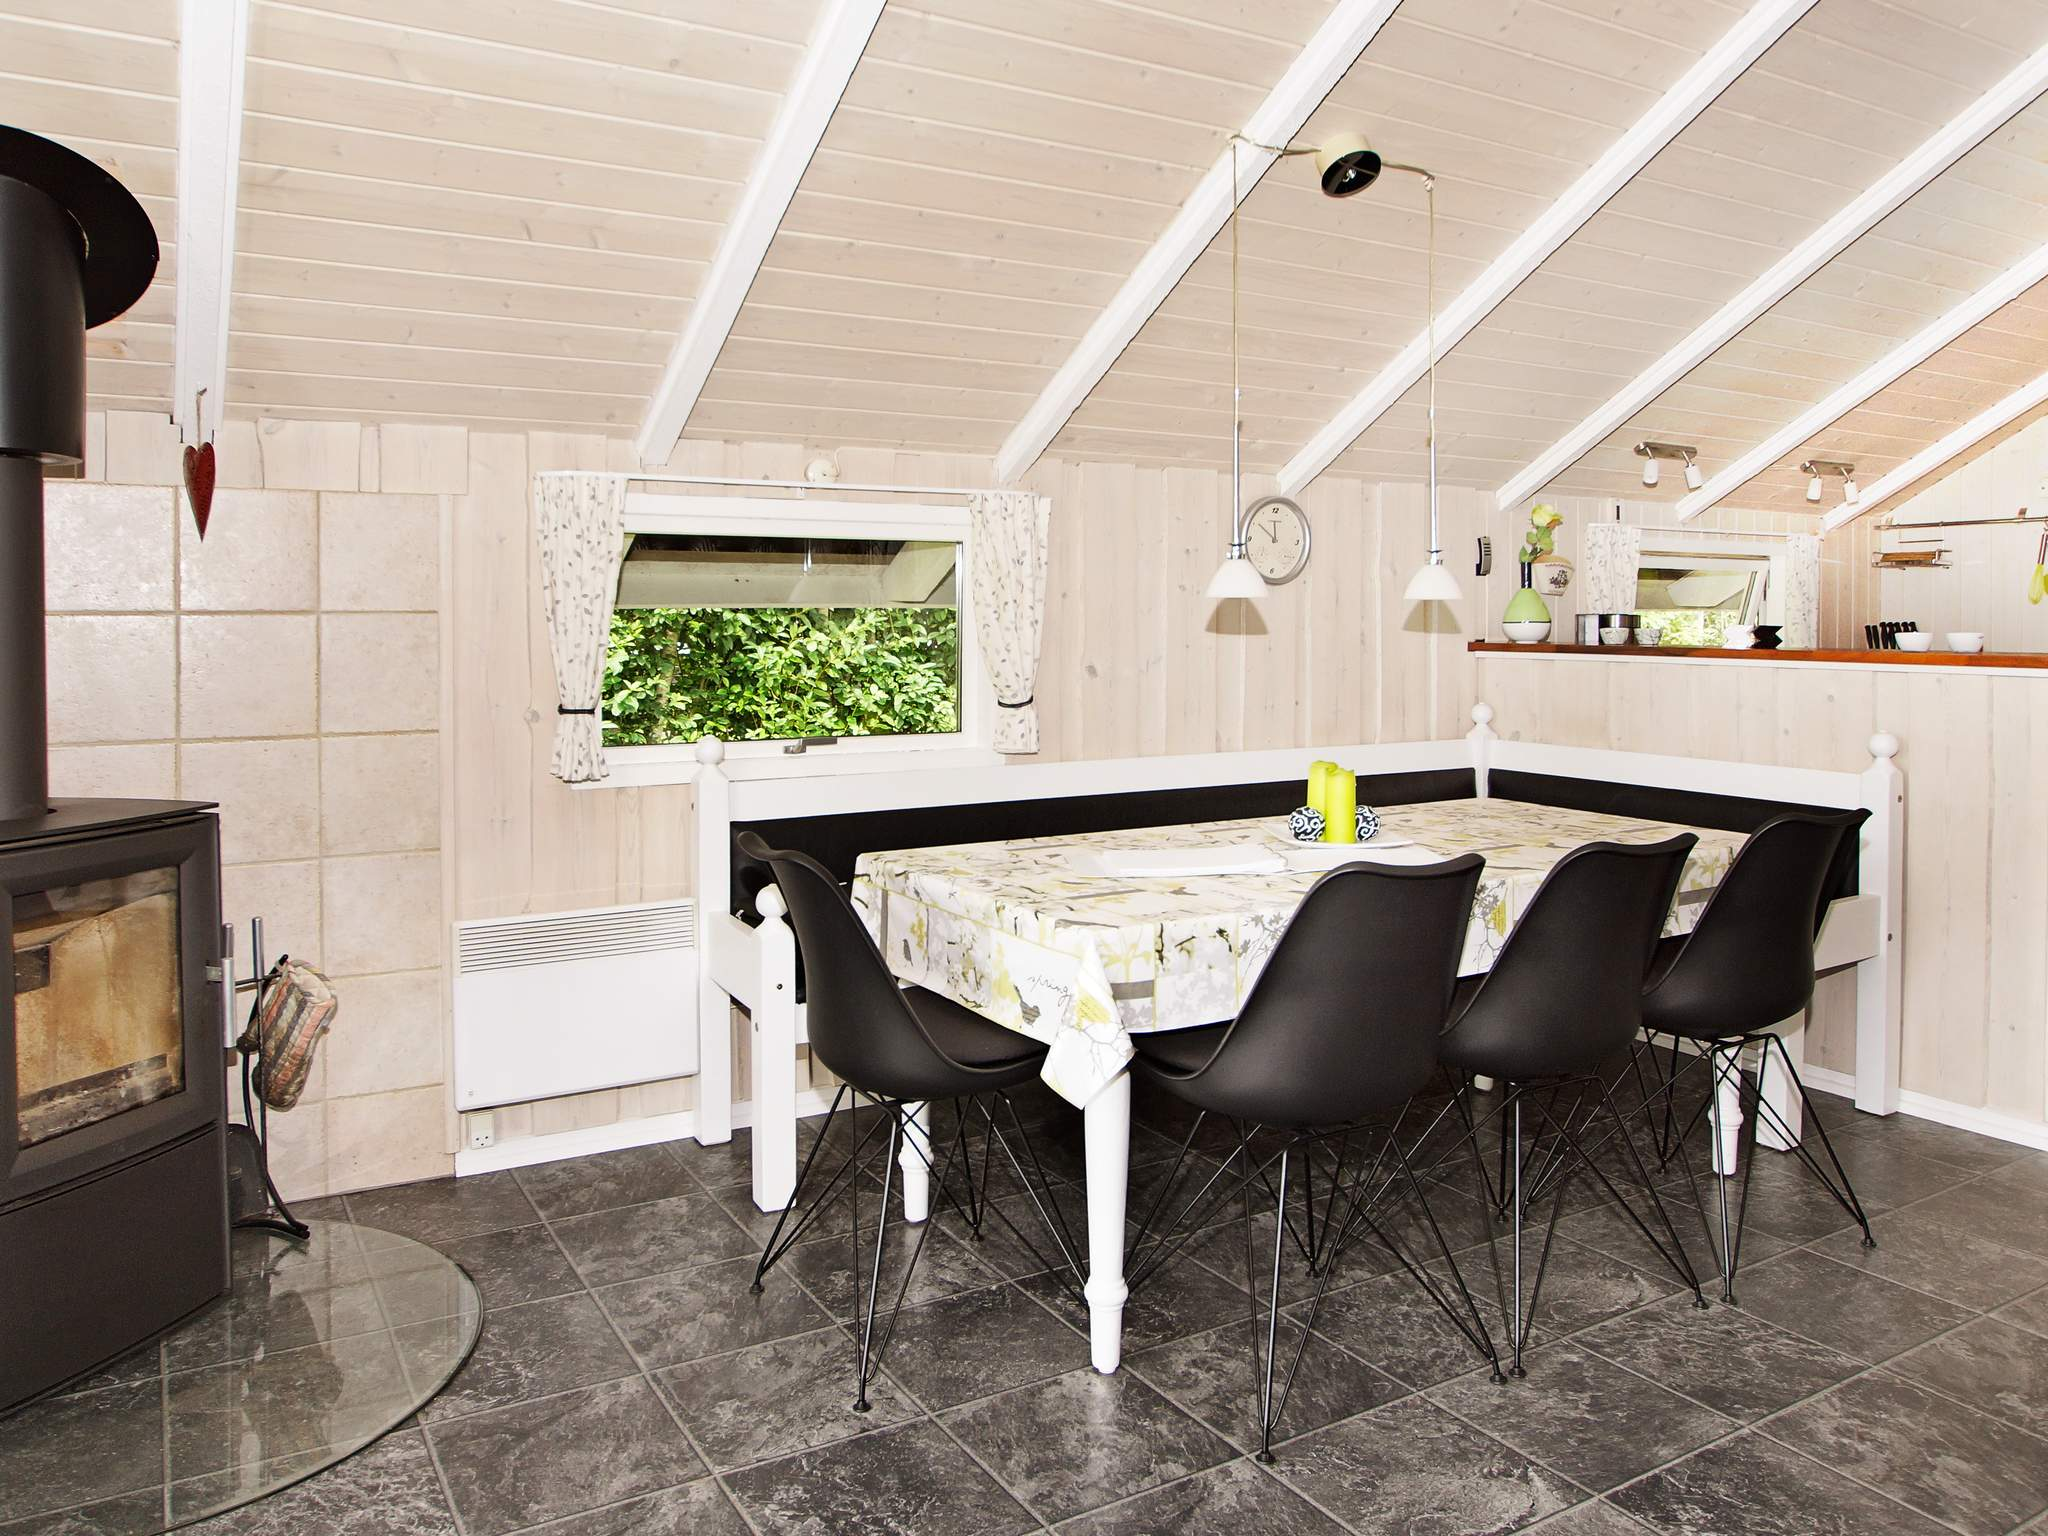 Ferienhaus Skaven Strand (88619), Tarm, , Westjütland, Dänemark, Bild 2